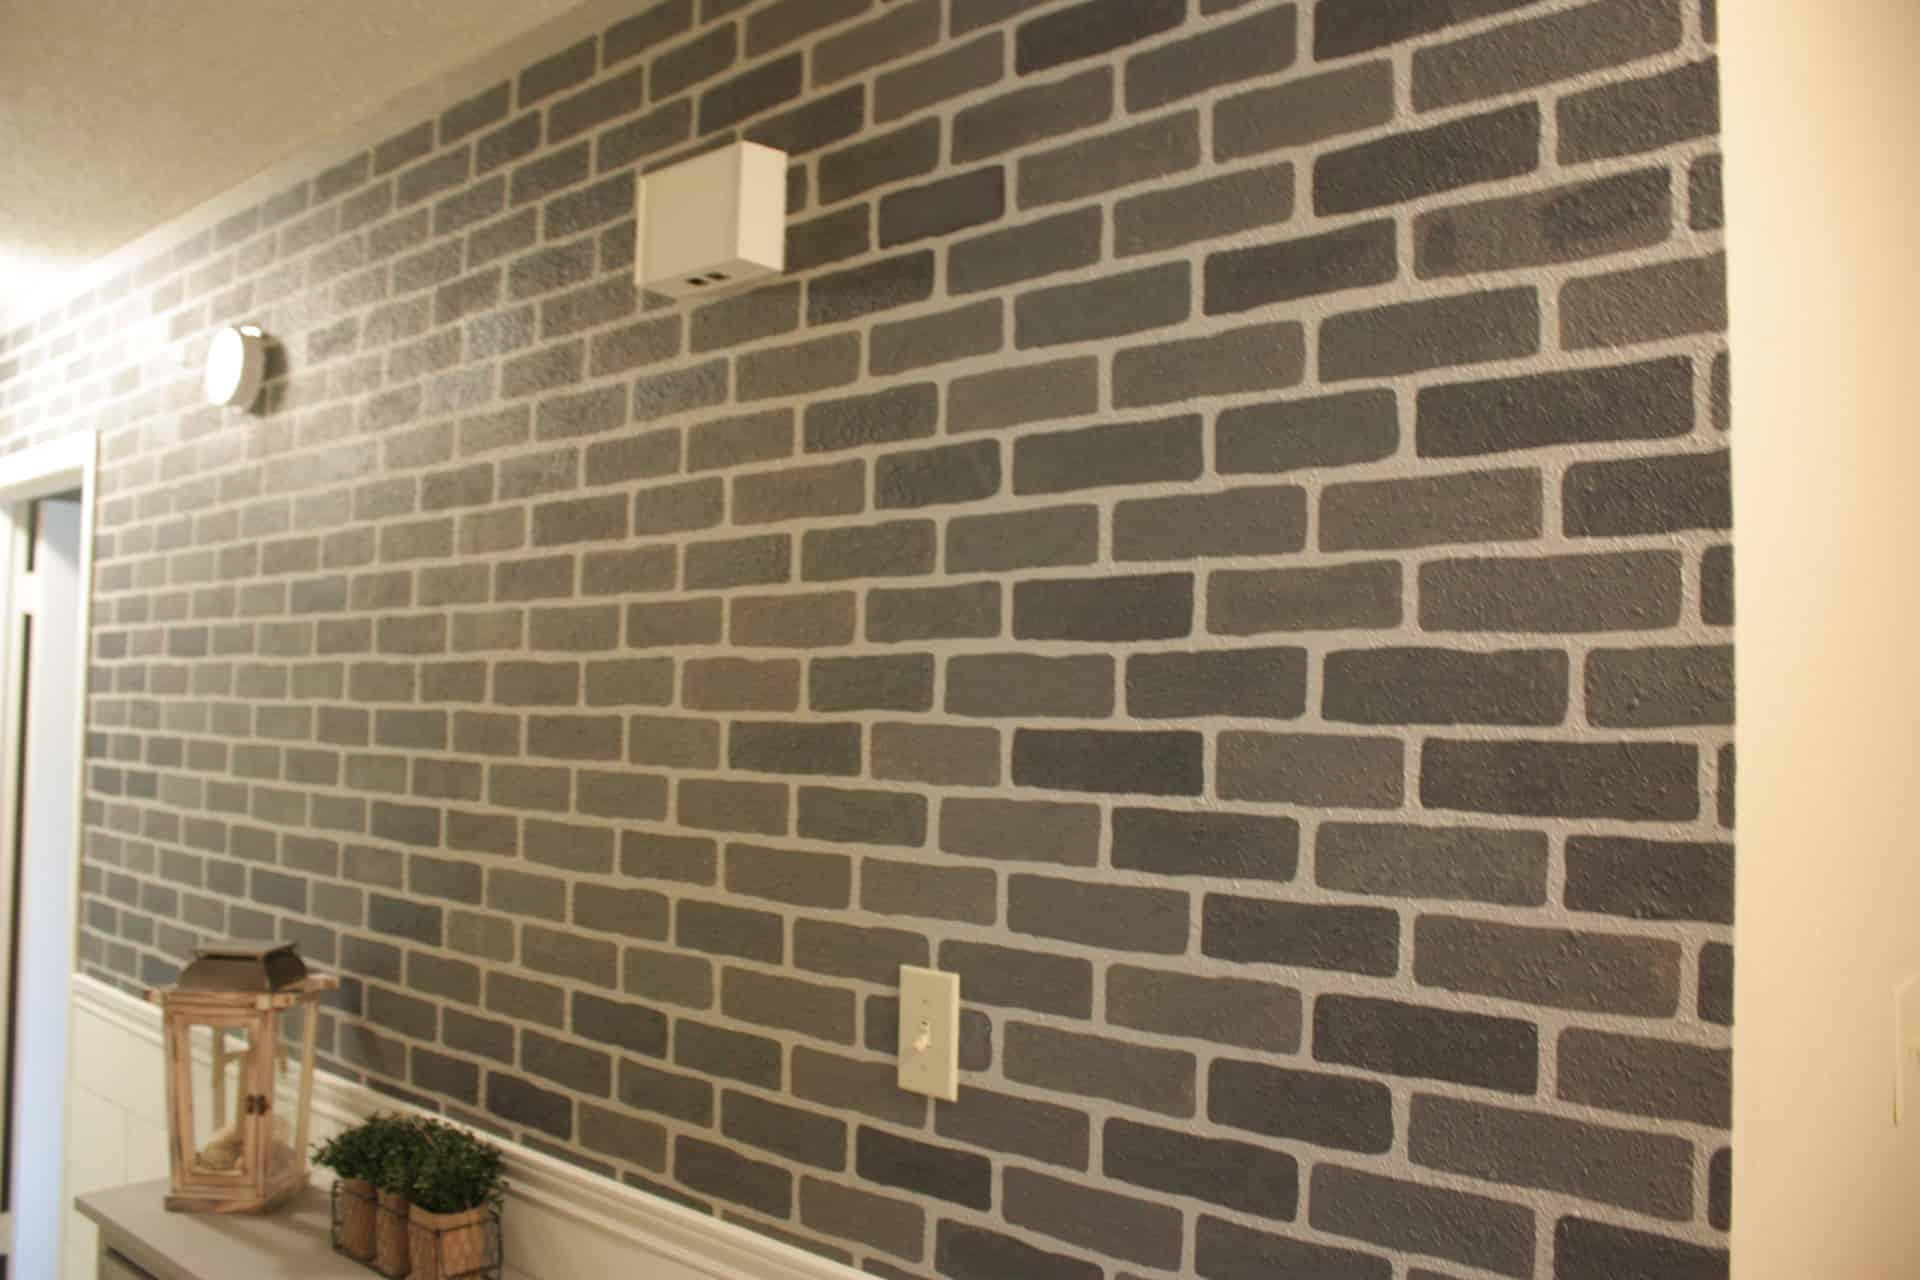 DIY Stenciled Brick Wall